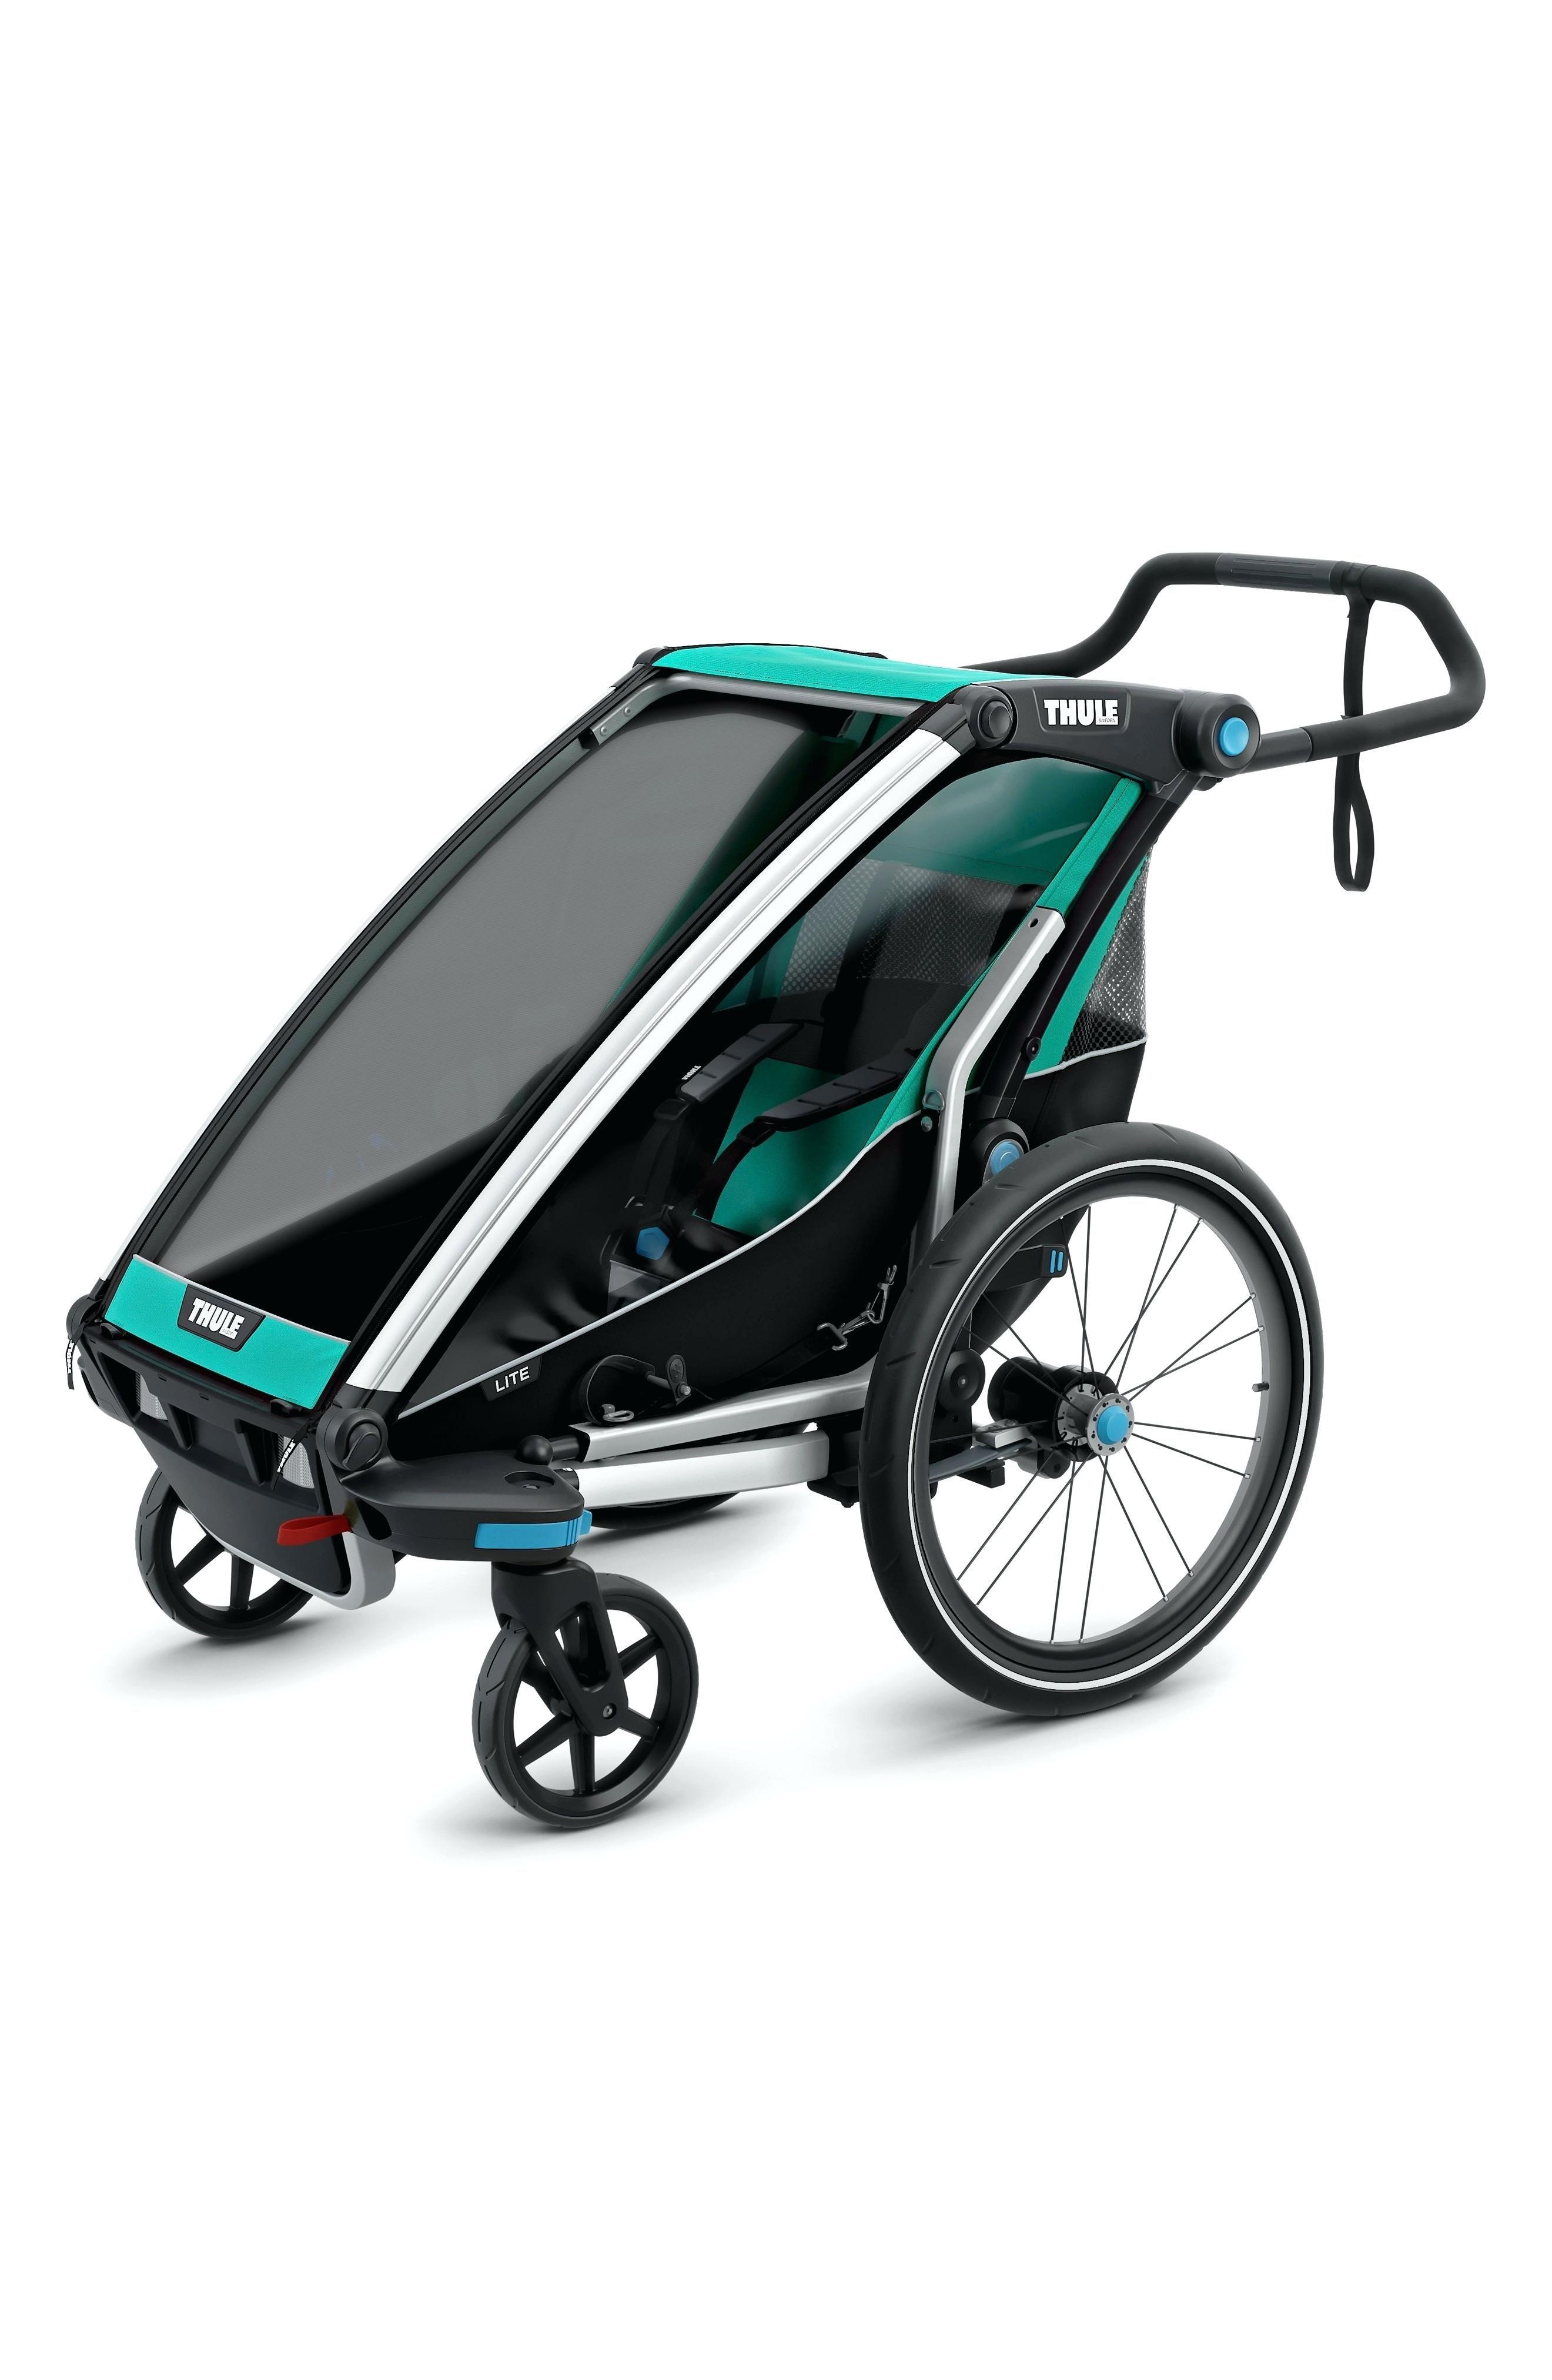 Kinderwagen Maclaren Automatische Faltung